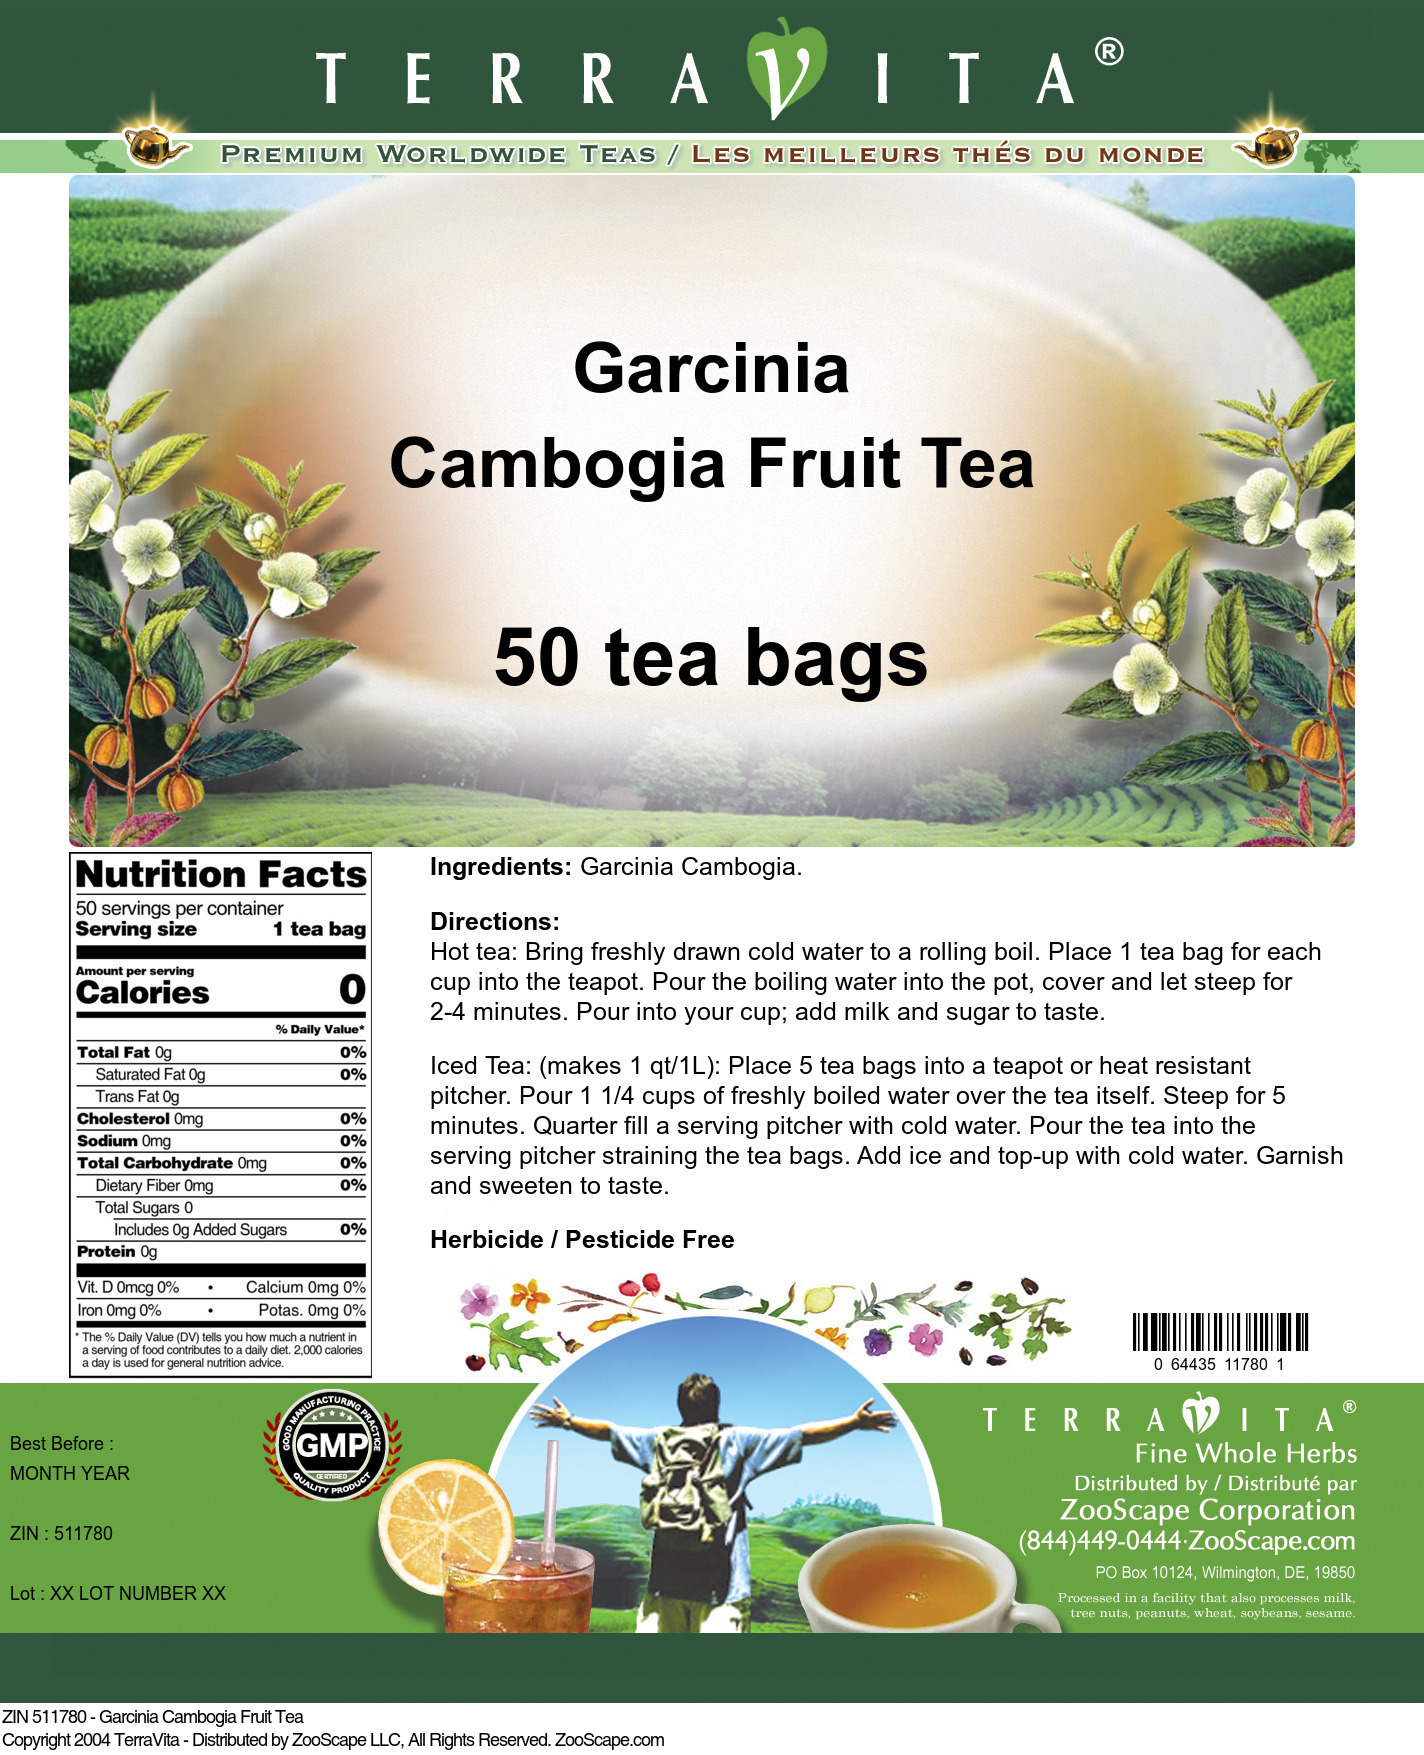 Garcinia Cambogia Fruit Tea